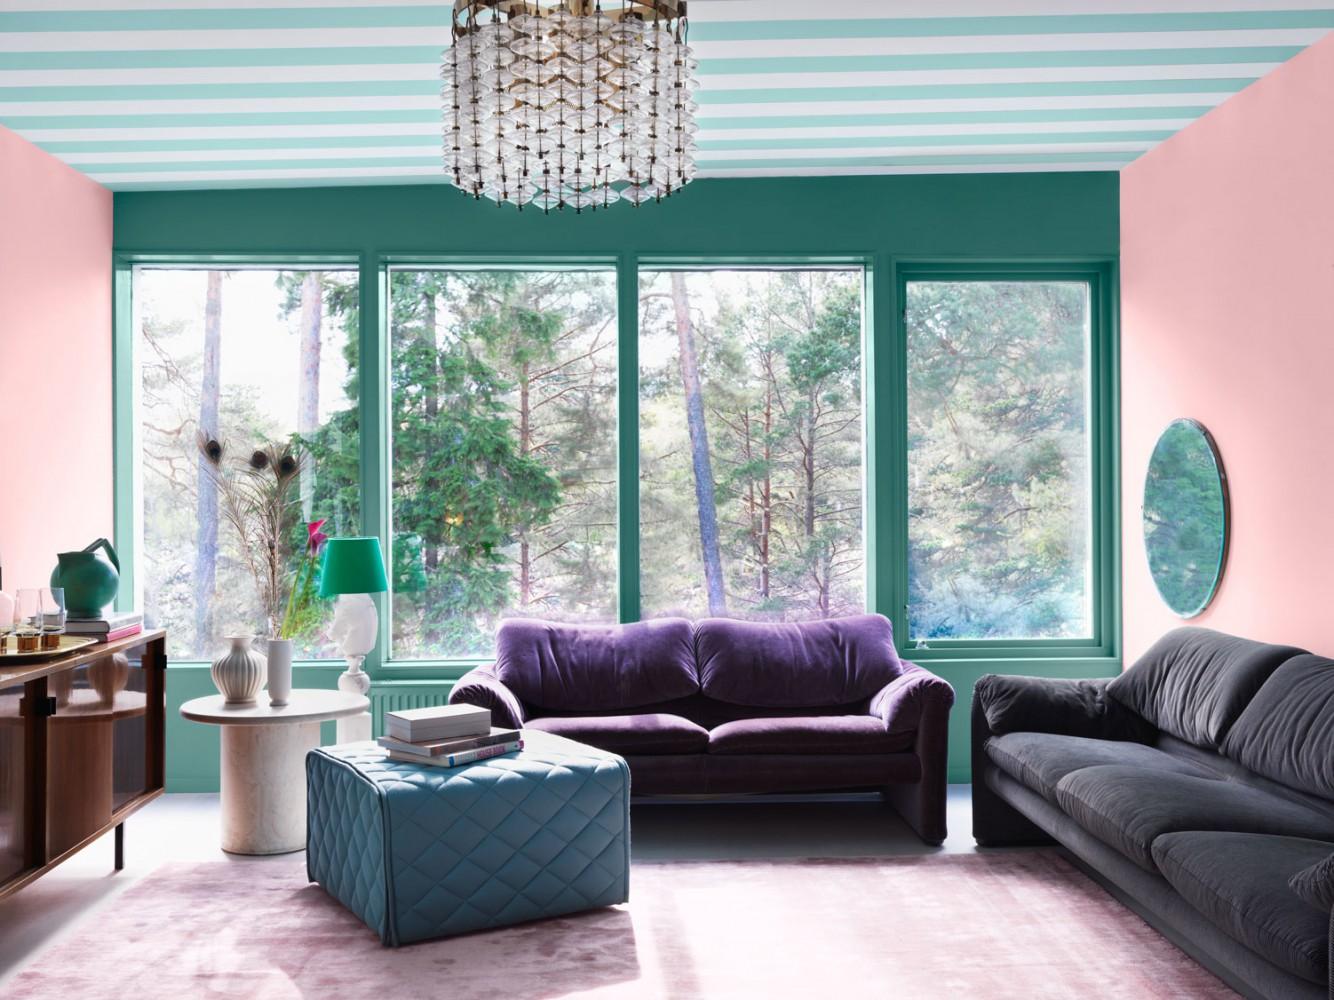 Alcro trend 2016 commercial jonas ingerstedt photography - Peinturer un plafond ...